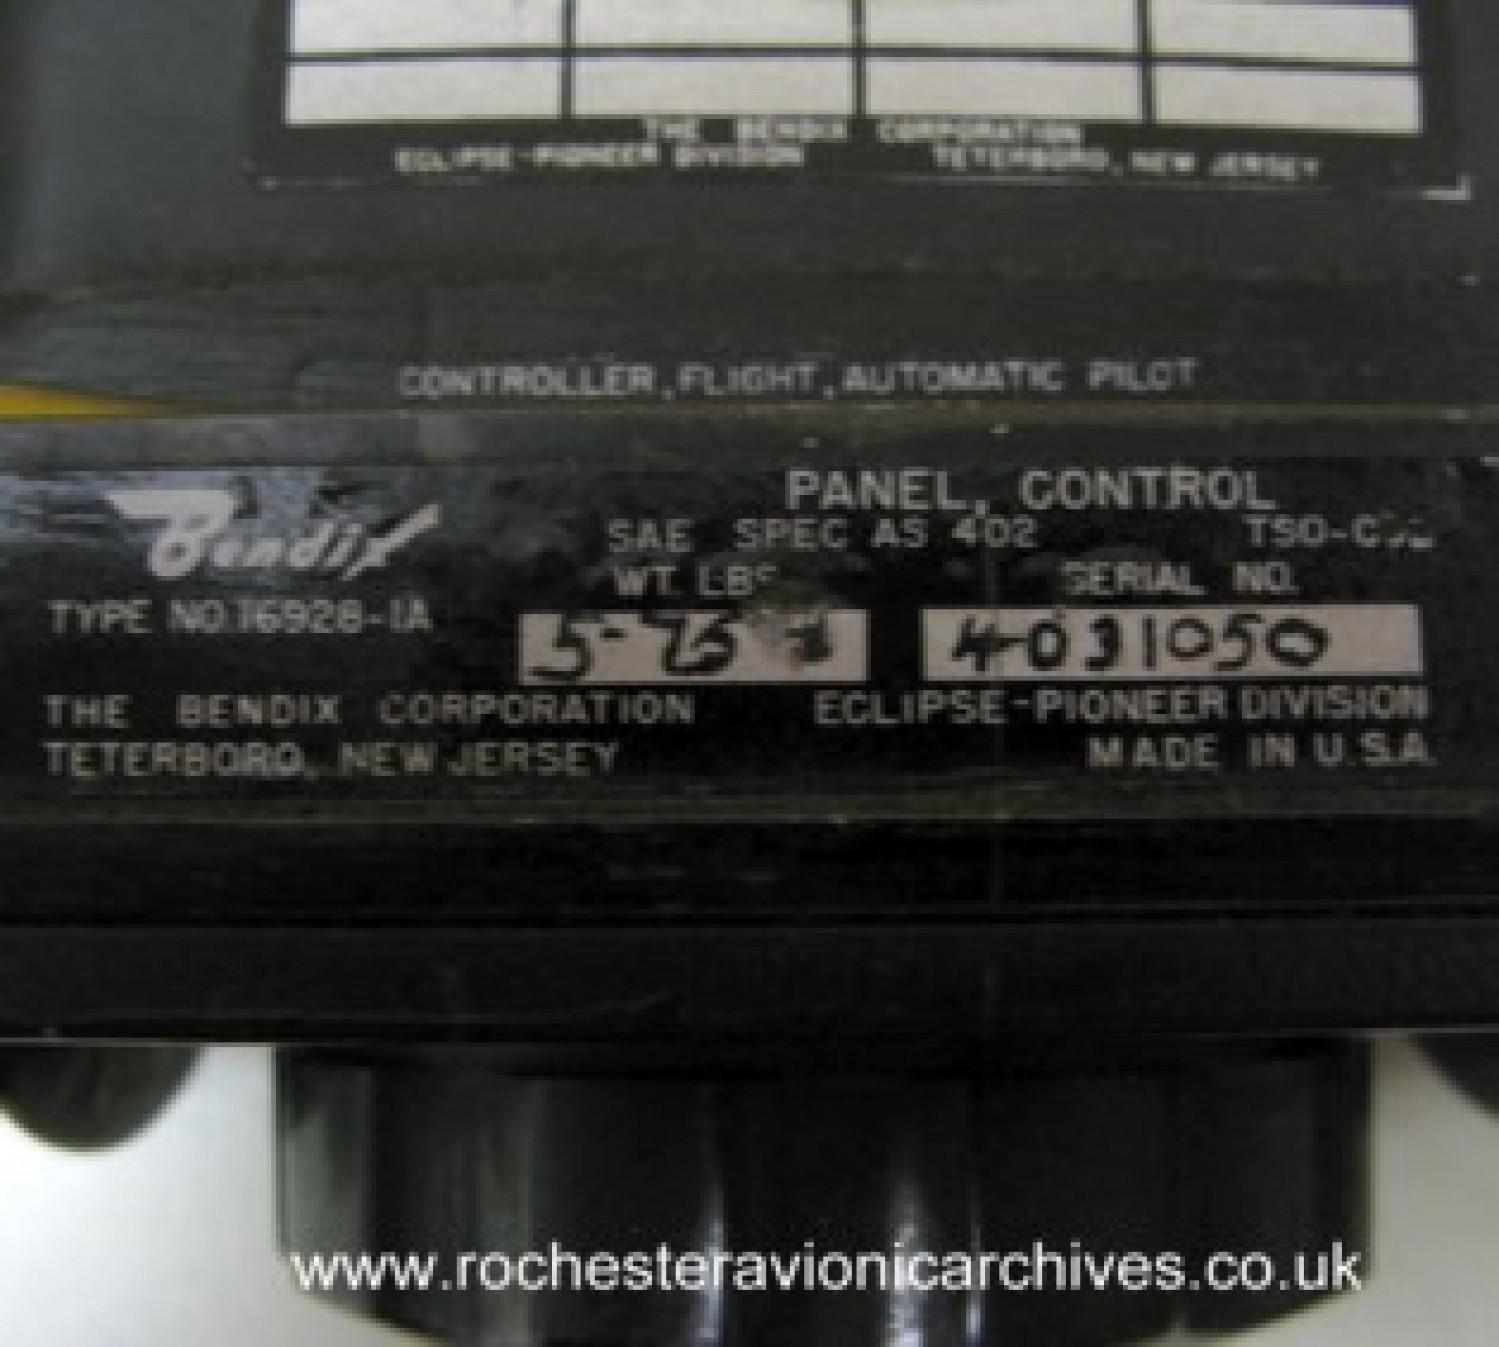 Autopilot Controller